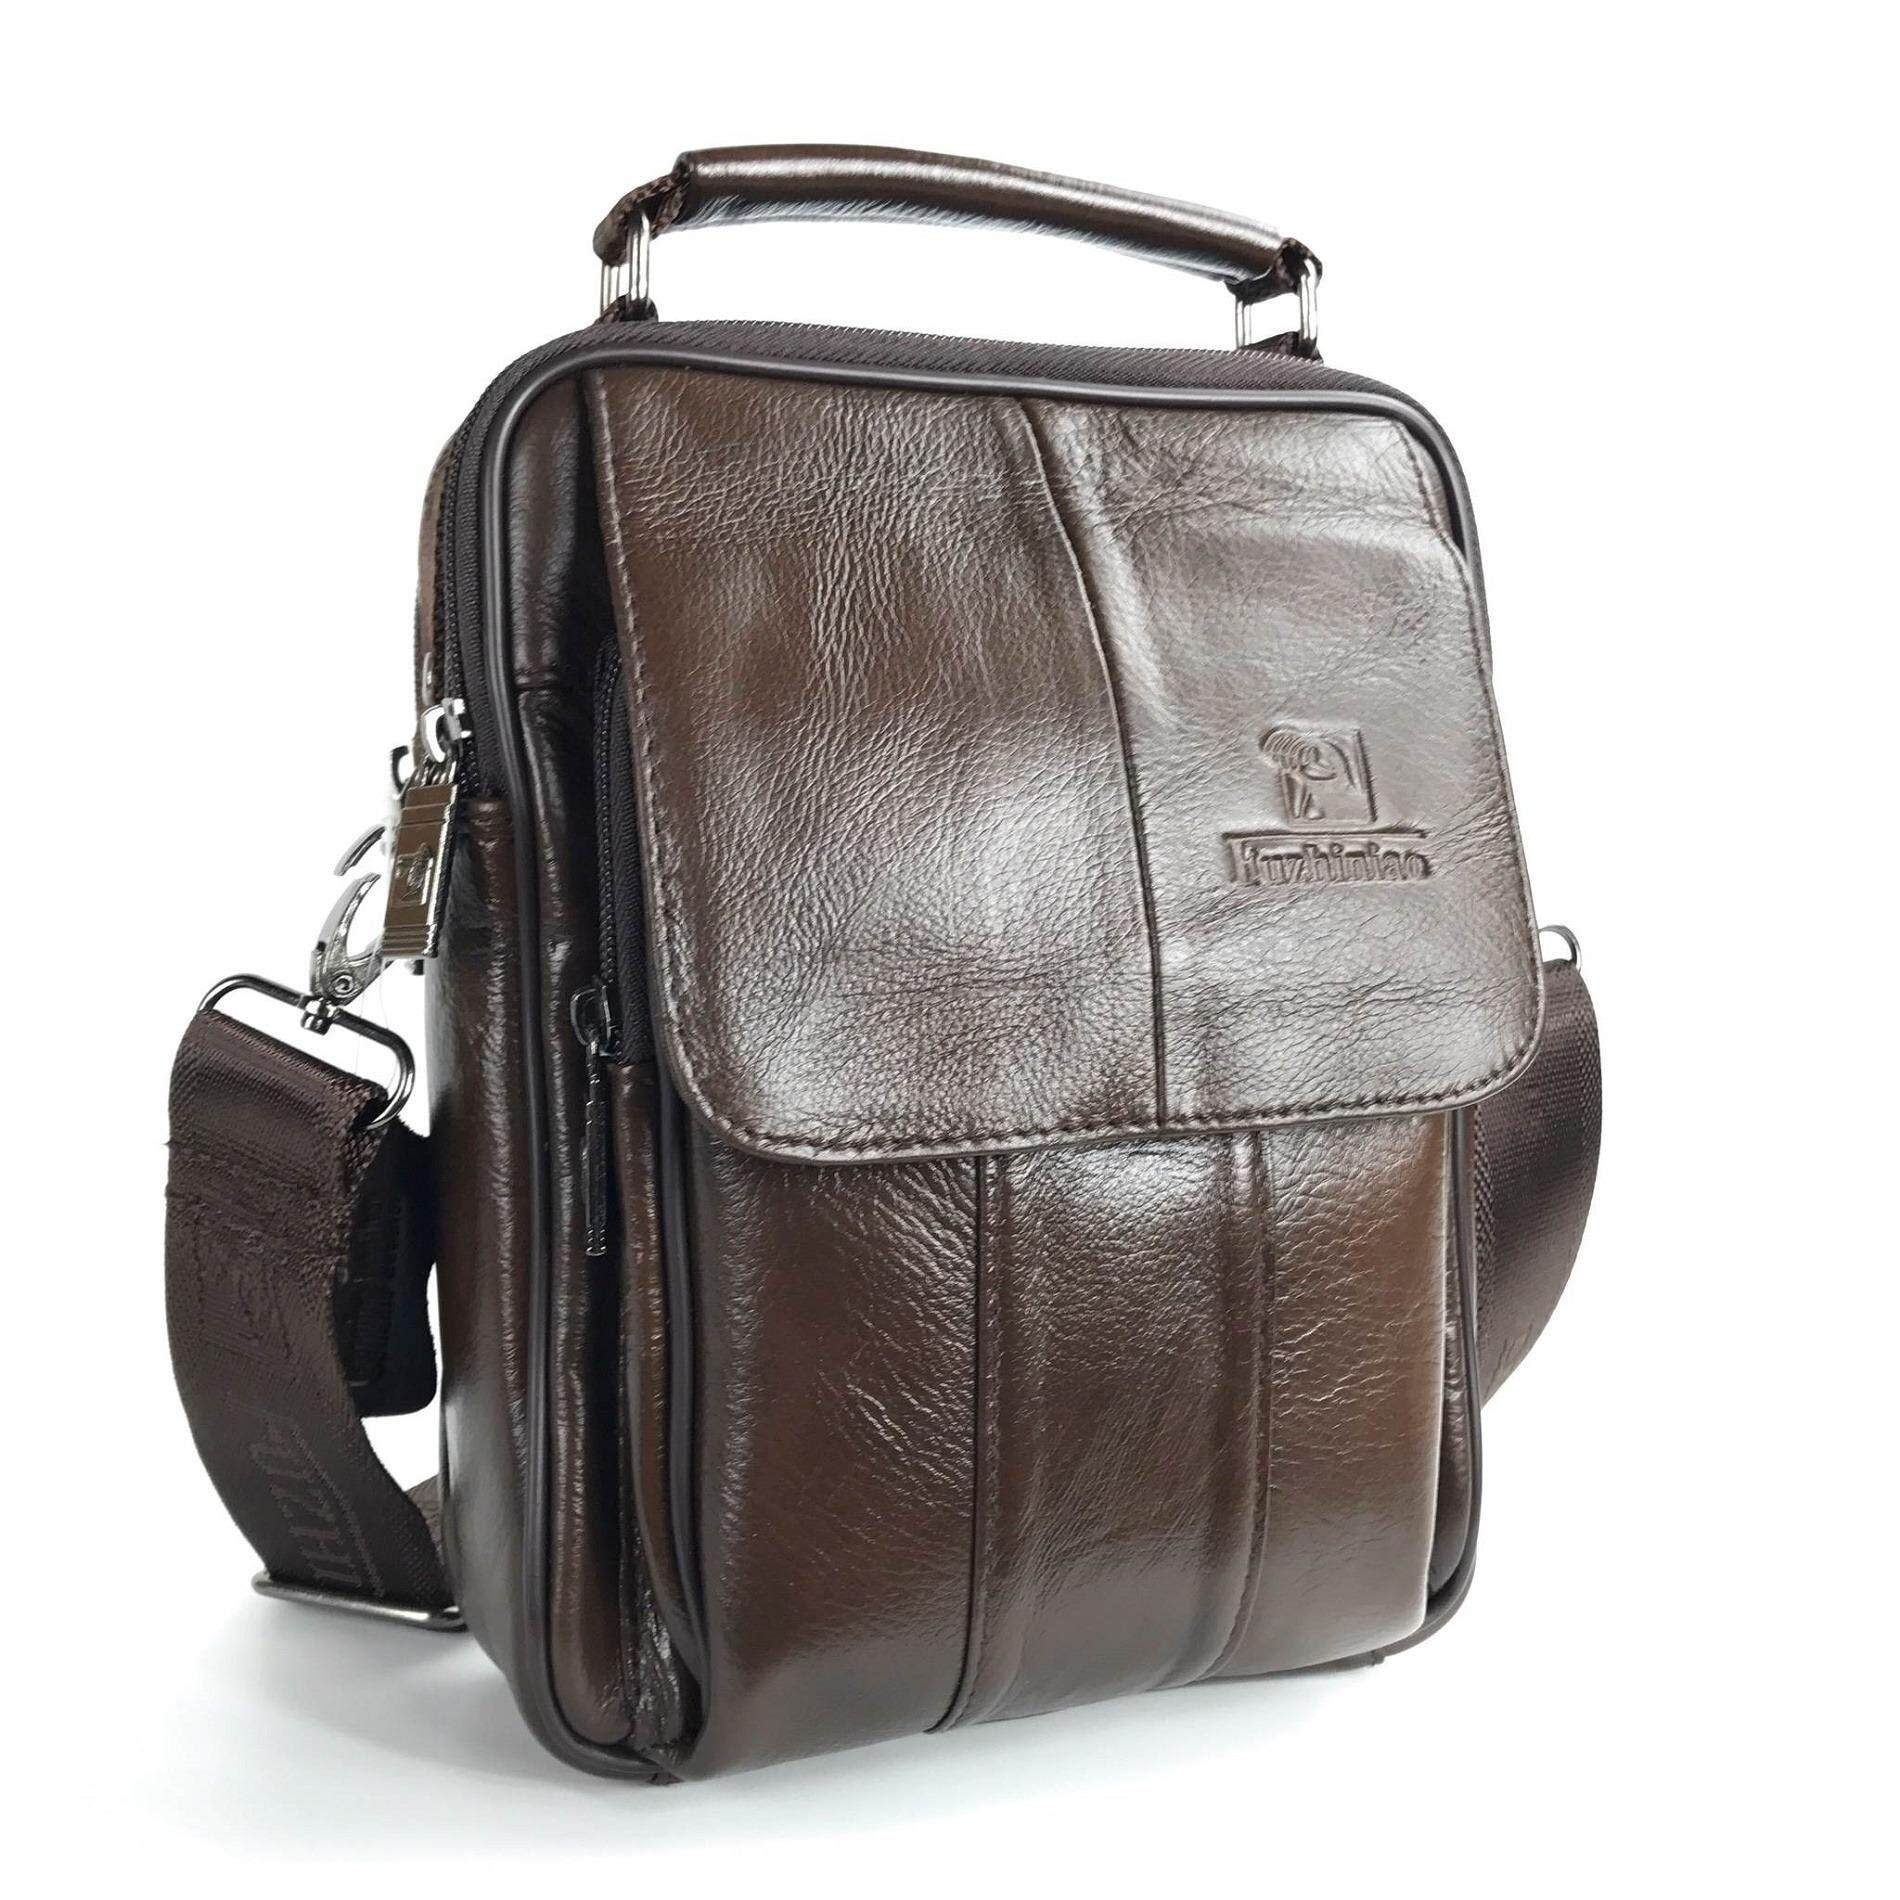 Chinatown Leather กระเป๋าสะพายหนังแท้ ขนาดIpad Mini สีน้ำตาล ใน กรุงเทพมหานคร